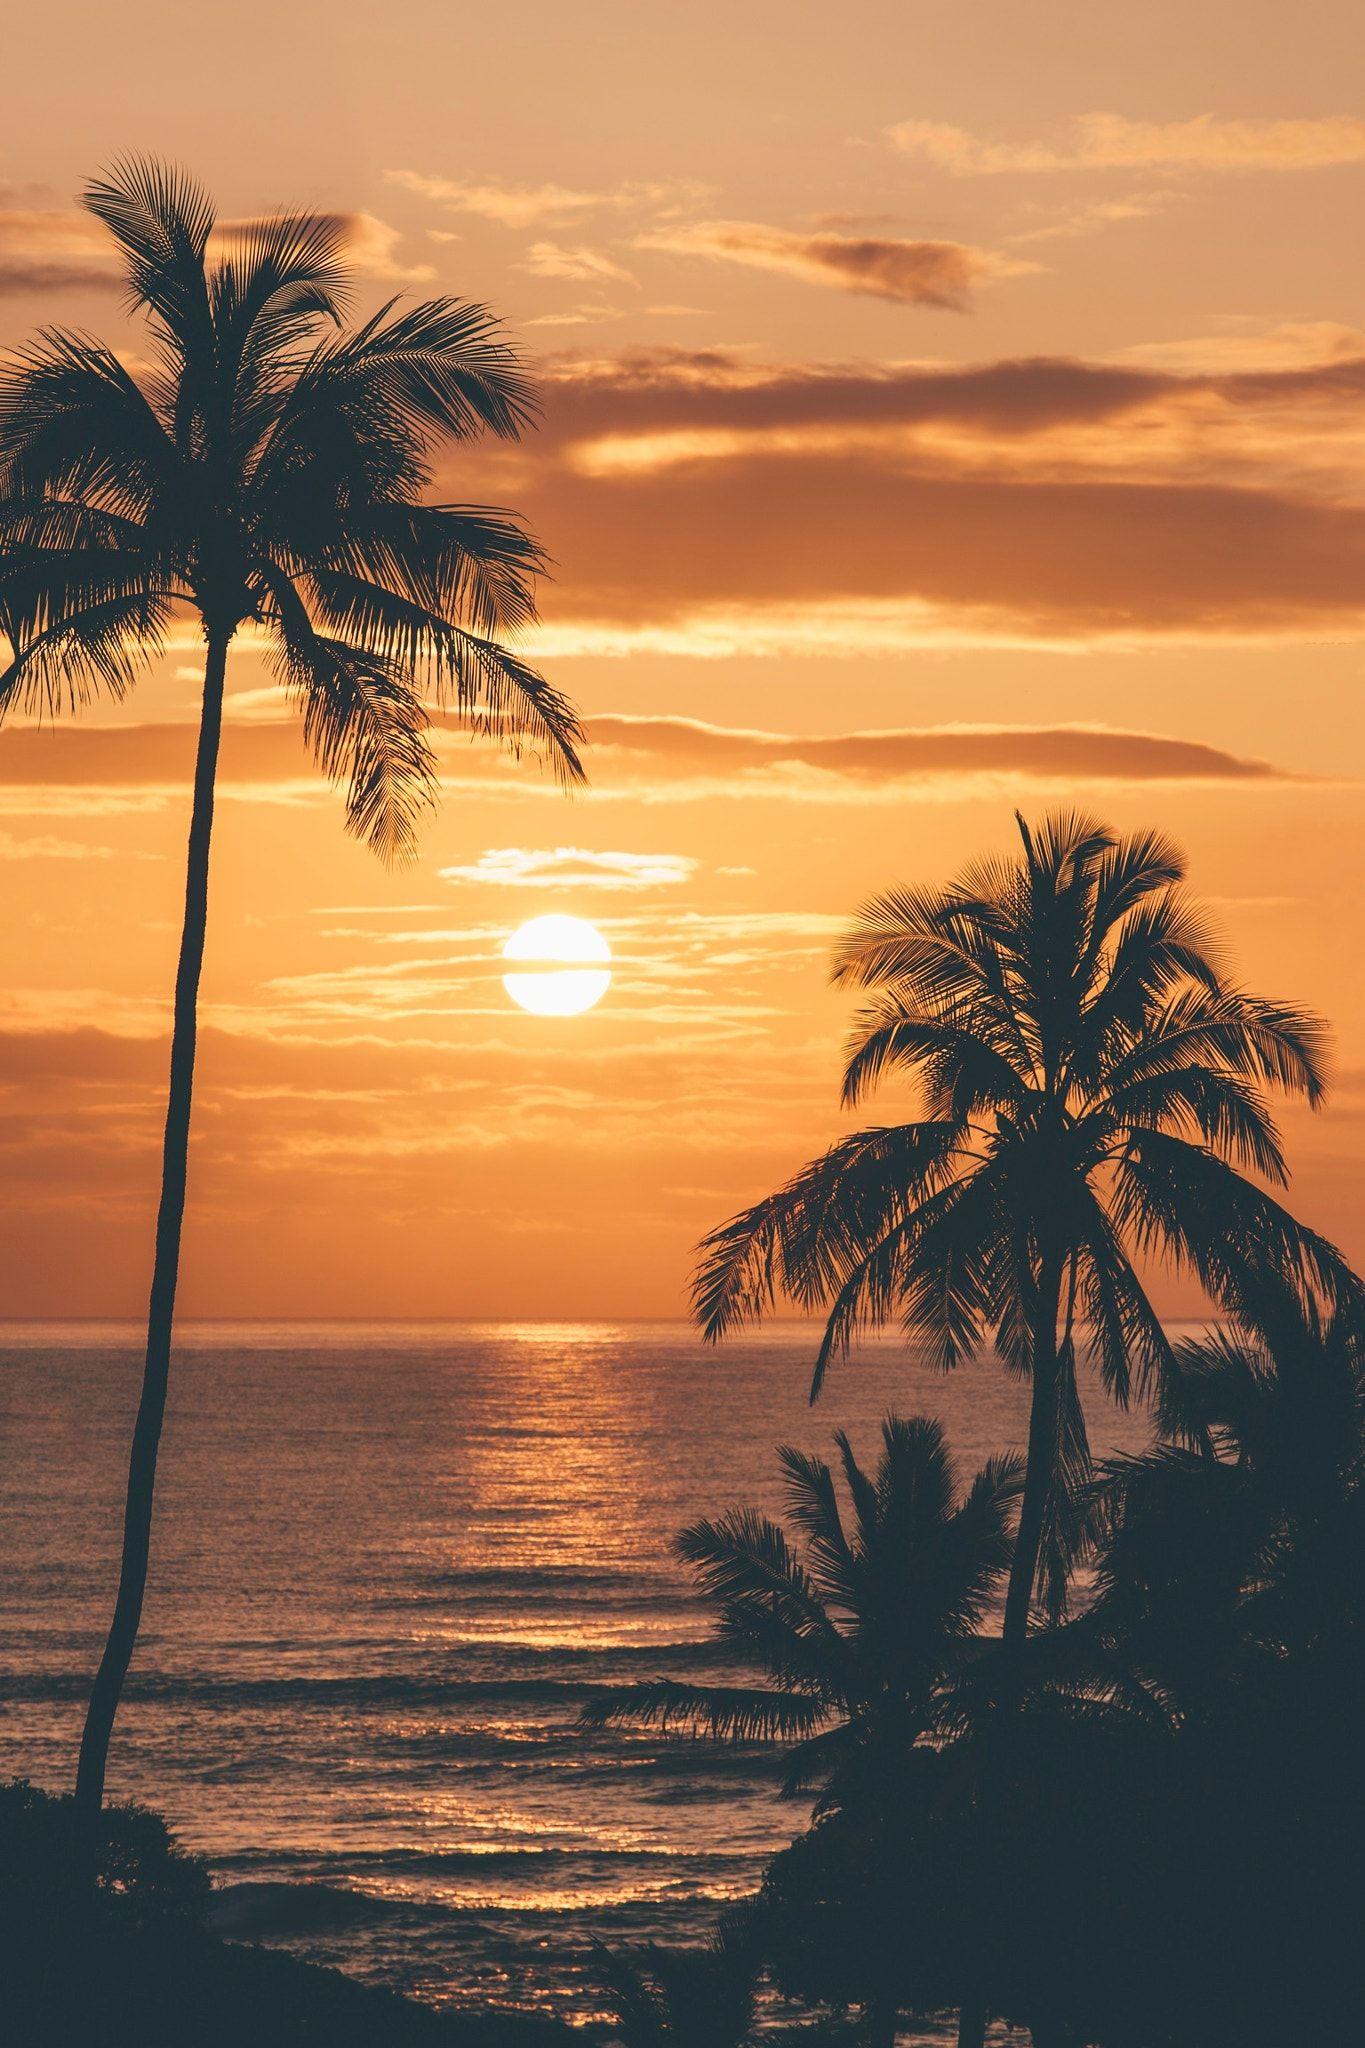 Sunrise in Kauai - | Natures Beauty | Pinterest | Sunset, Palm and ...